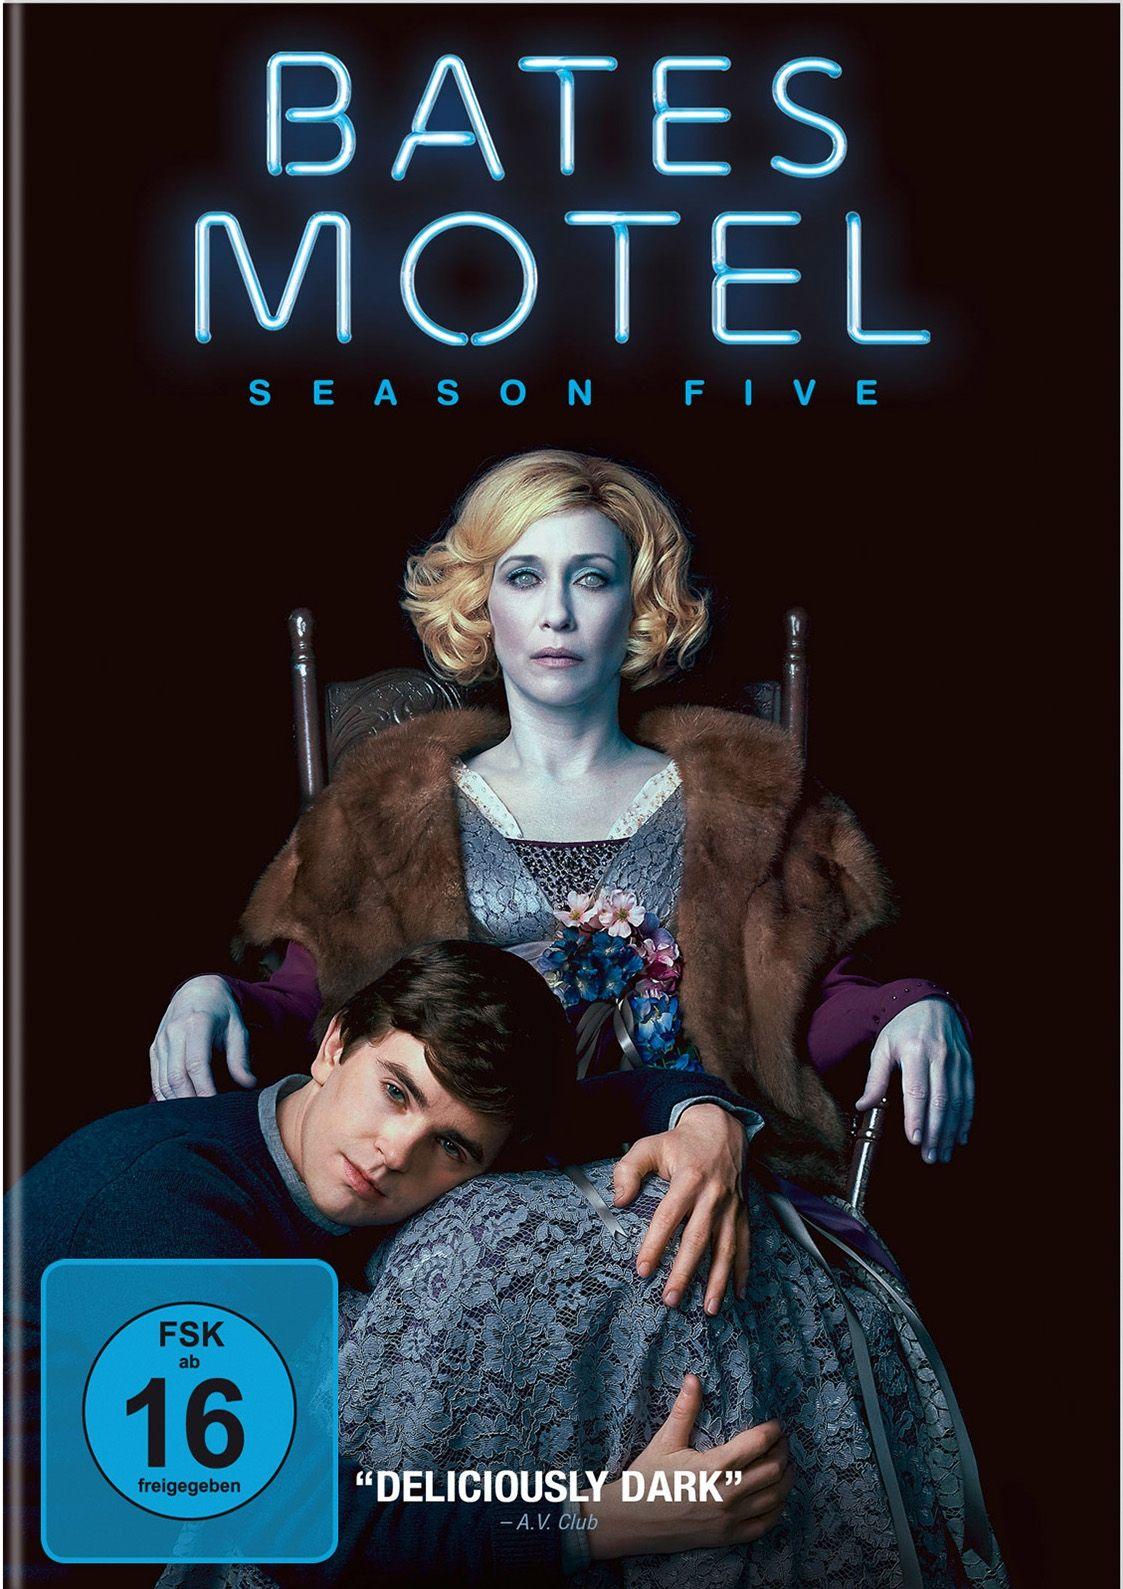 Bates Motel - Season 5 (3 Discs)